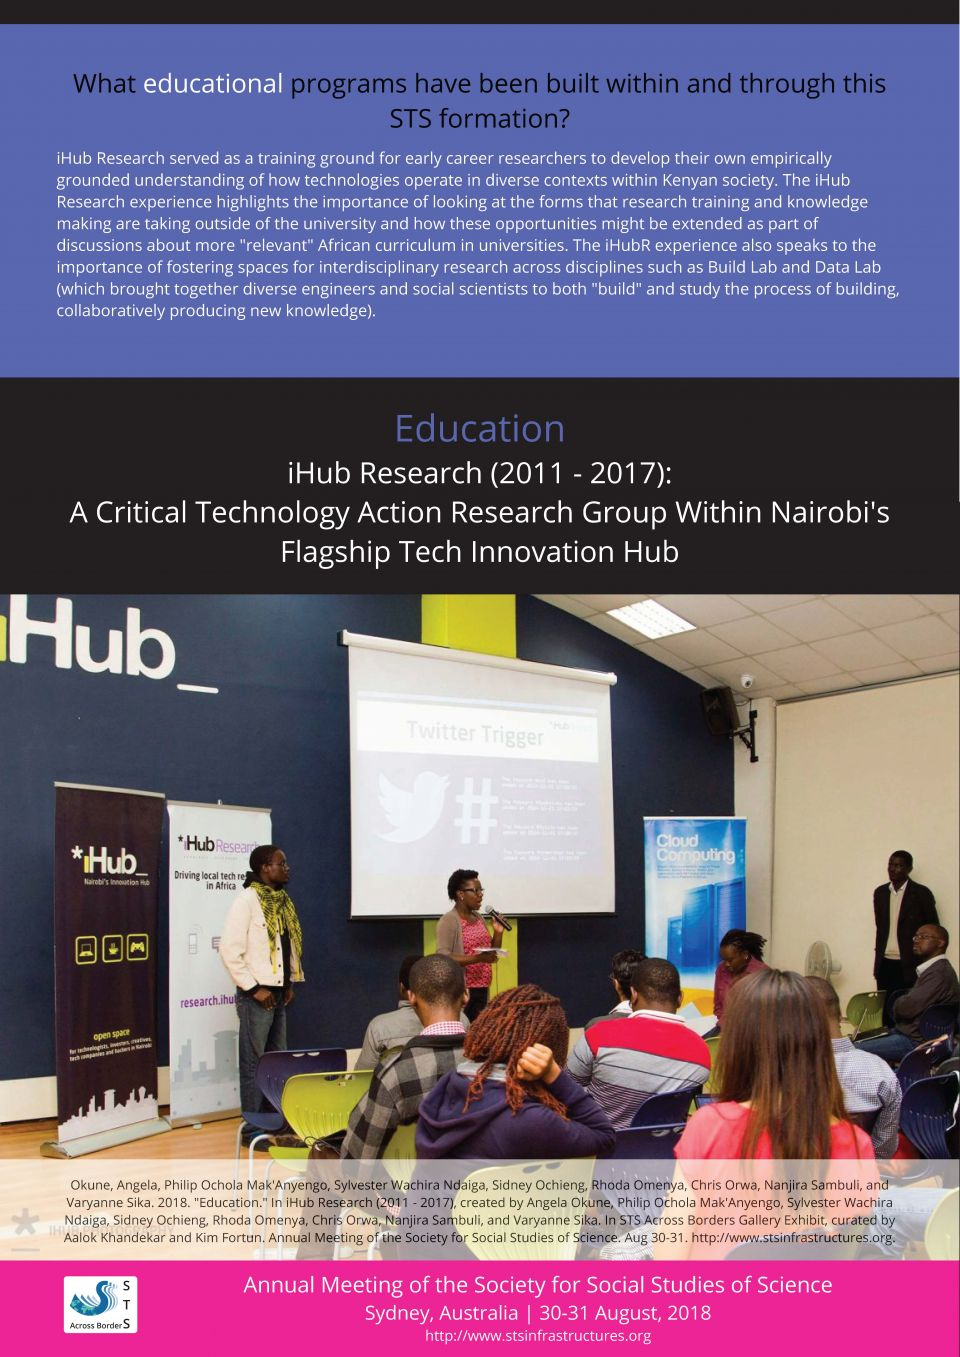 iHub Education